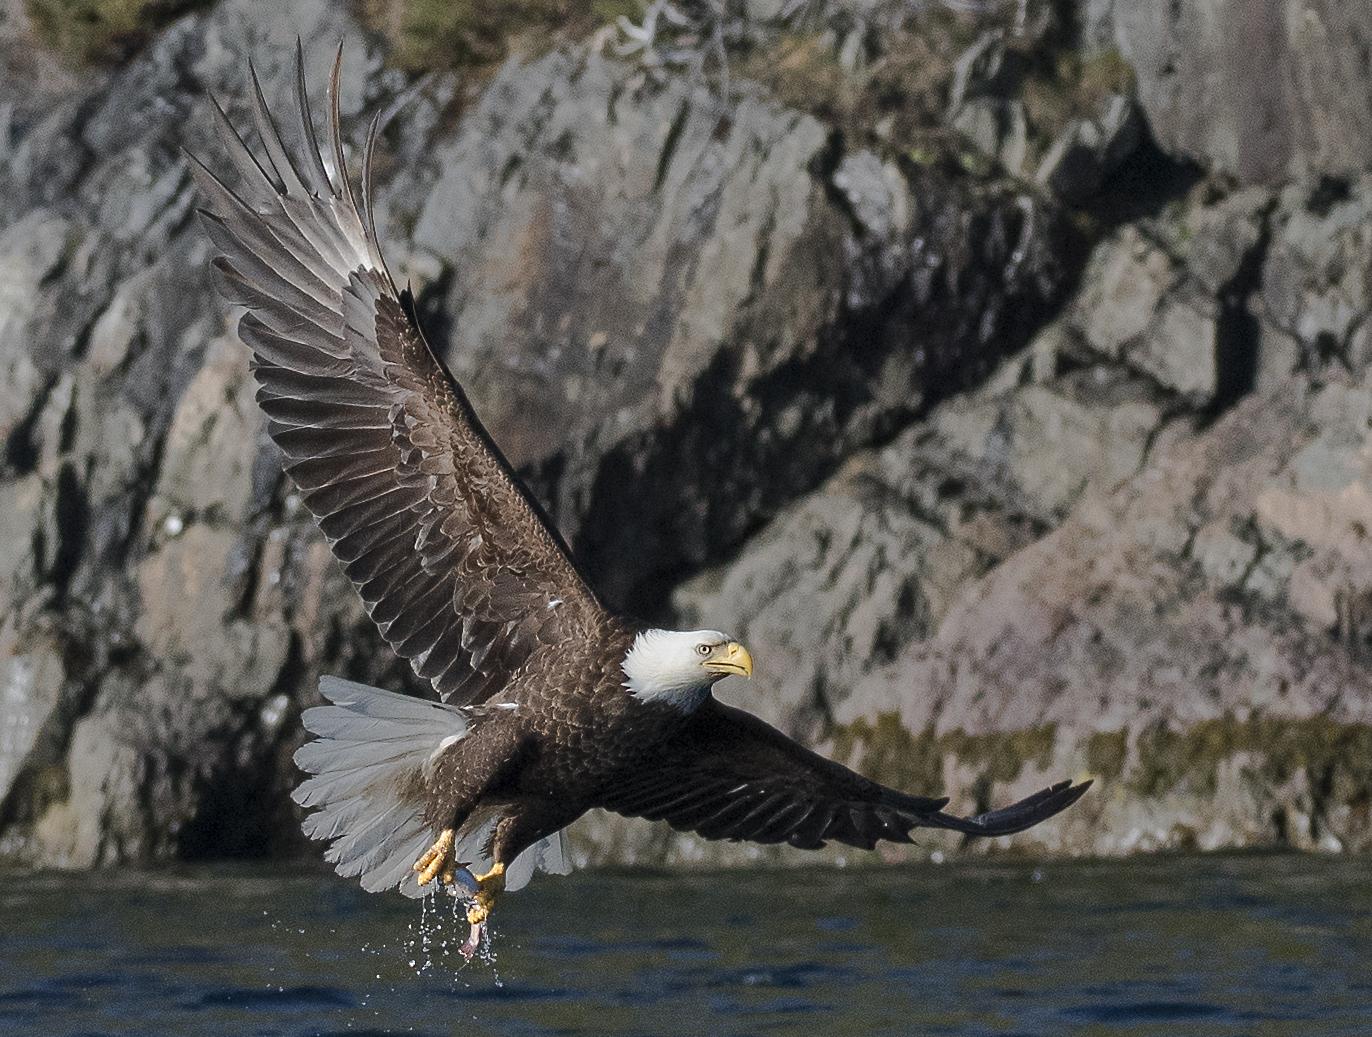 bald eagle with fish.jpg